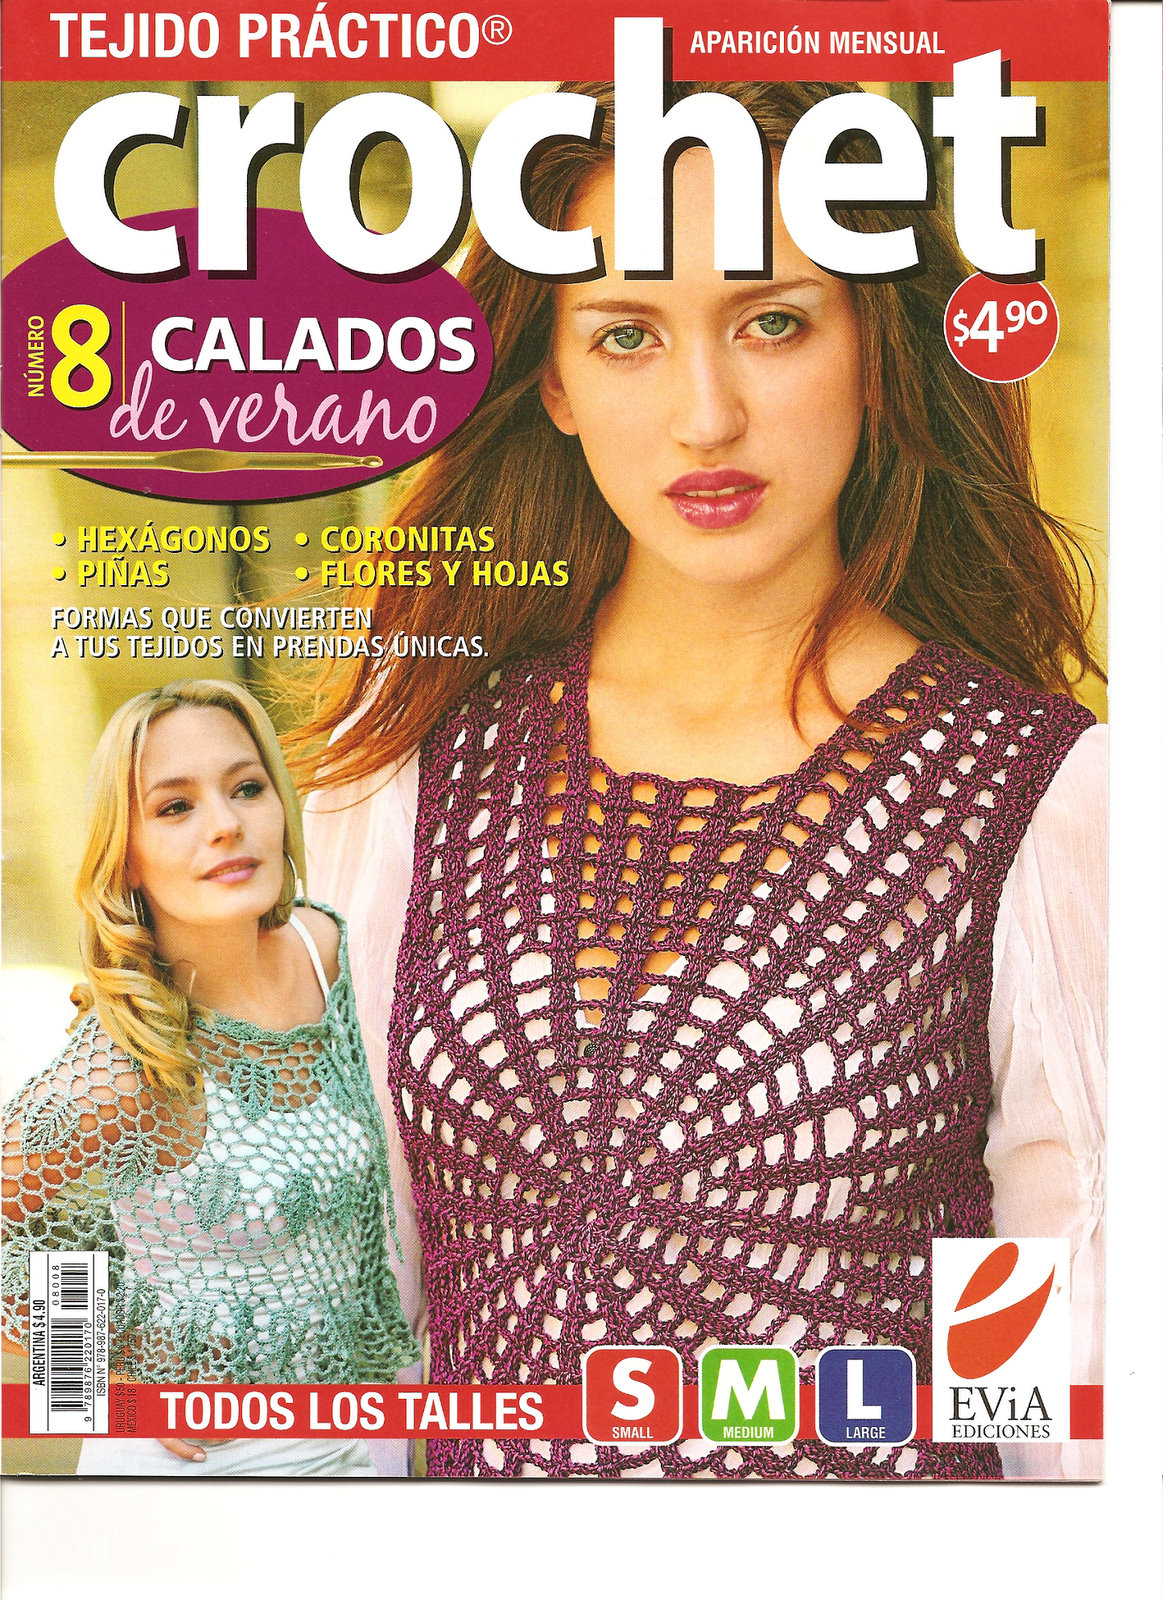 Revista: Crochet Calados - 8